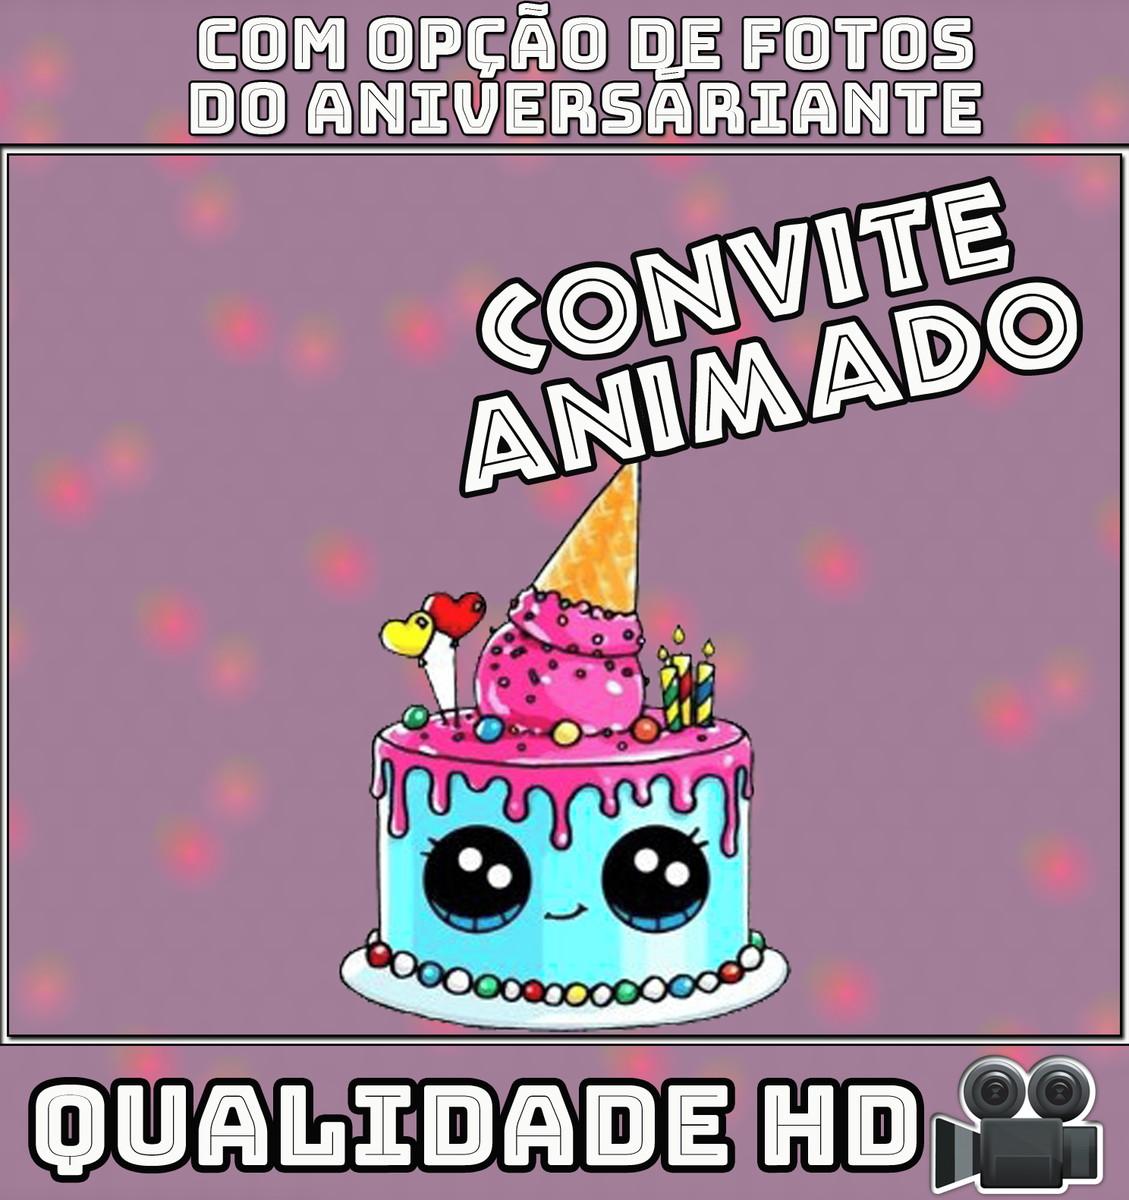 Convite Animado Vídeo Pra Aniversário Kawaii No Elo7 Festa